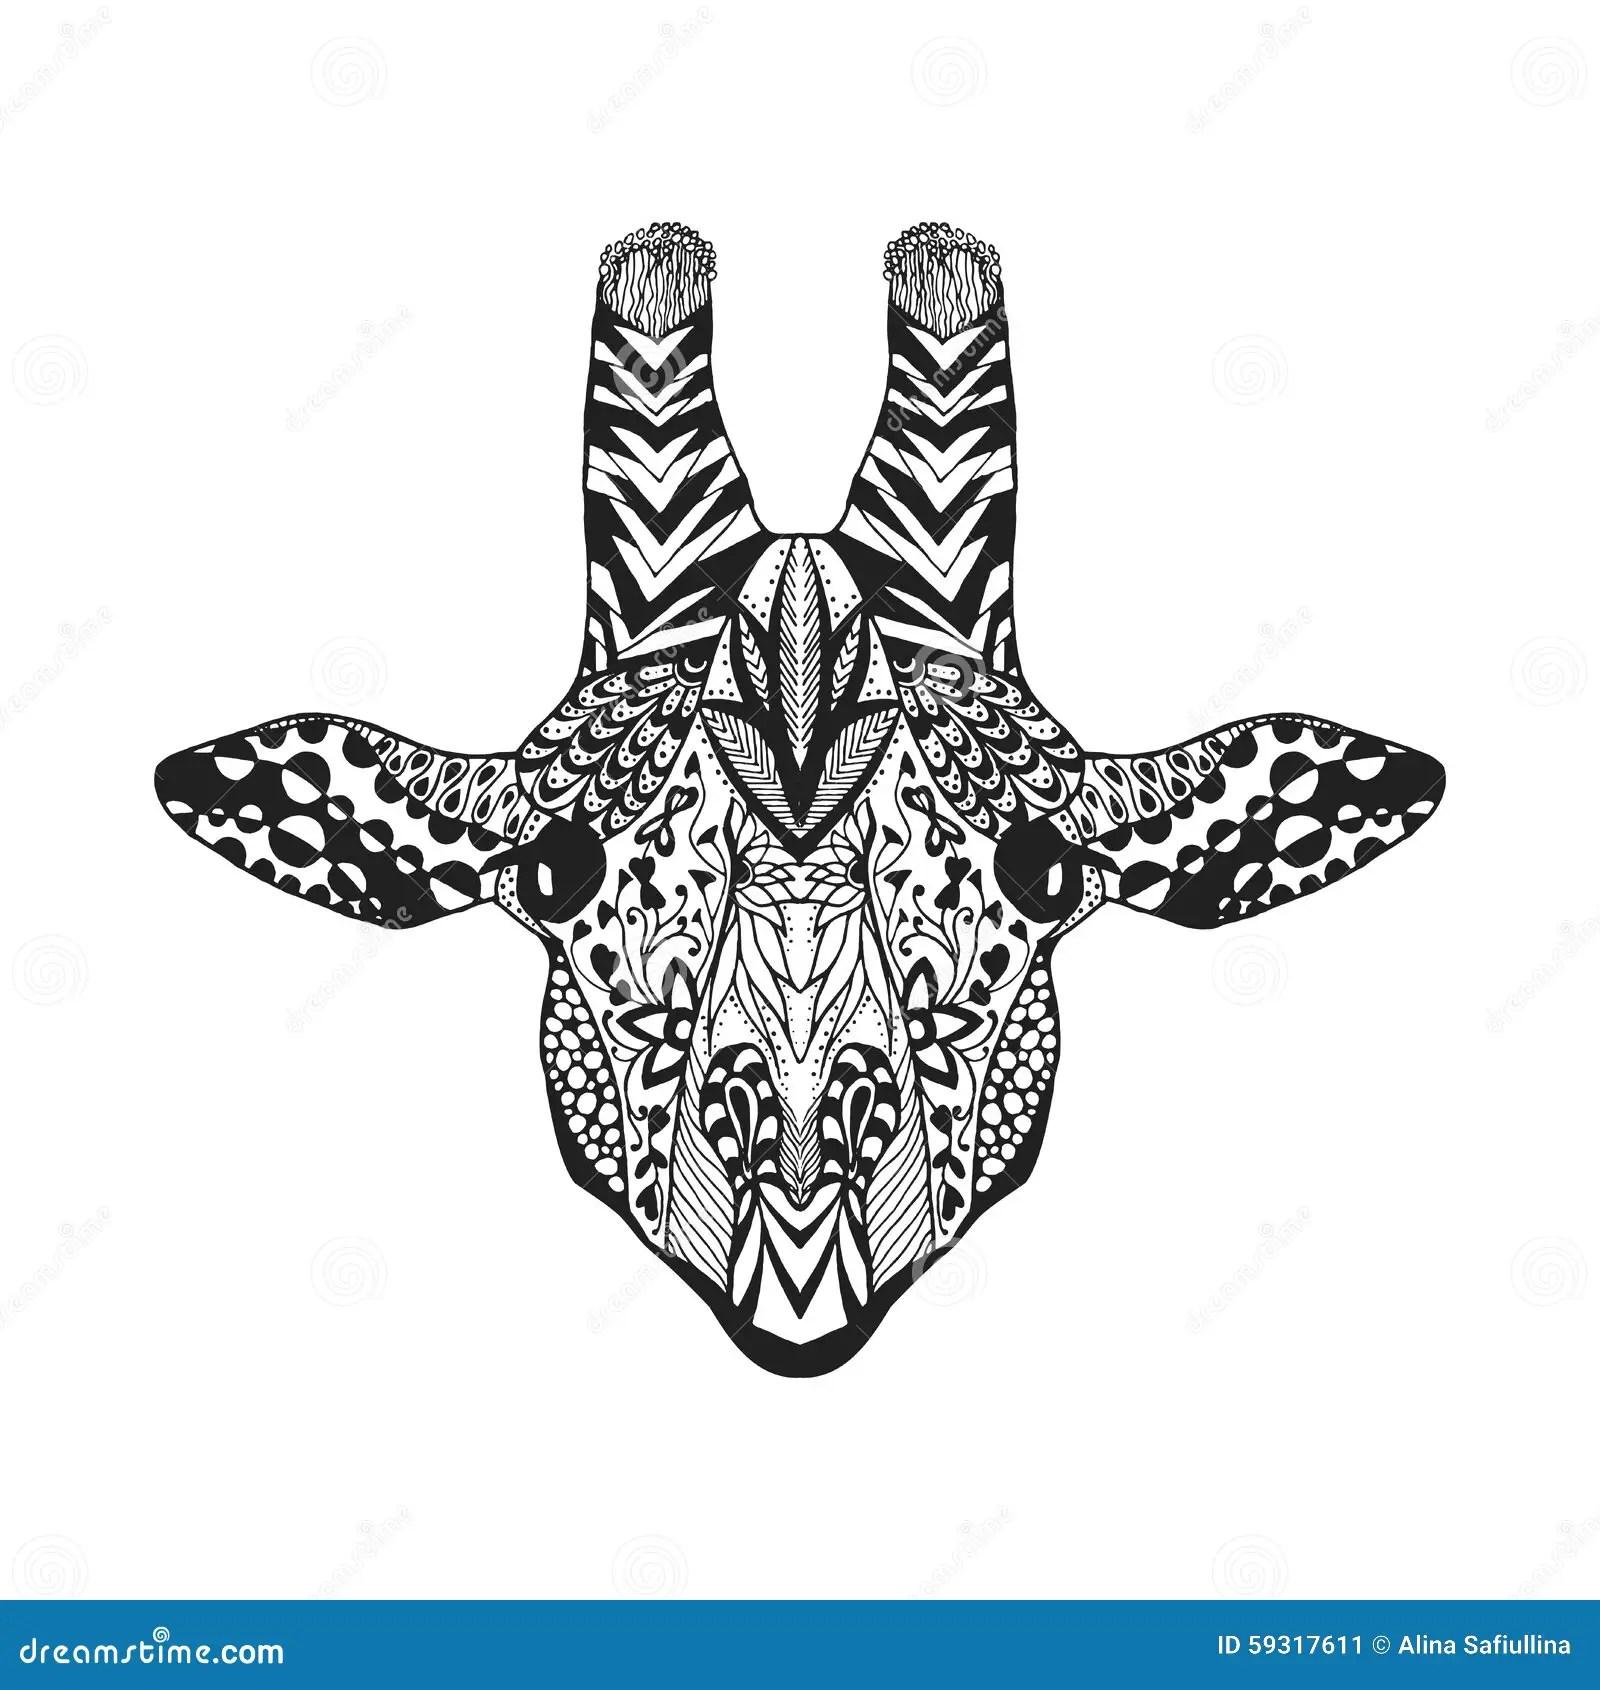 Zentangle Stylized Giraffe Sketch For Tattoo Or T Shirt